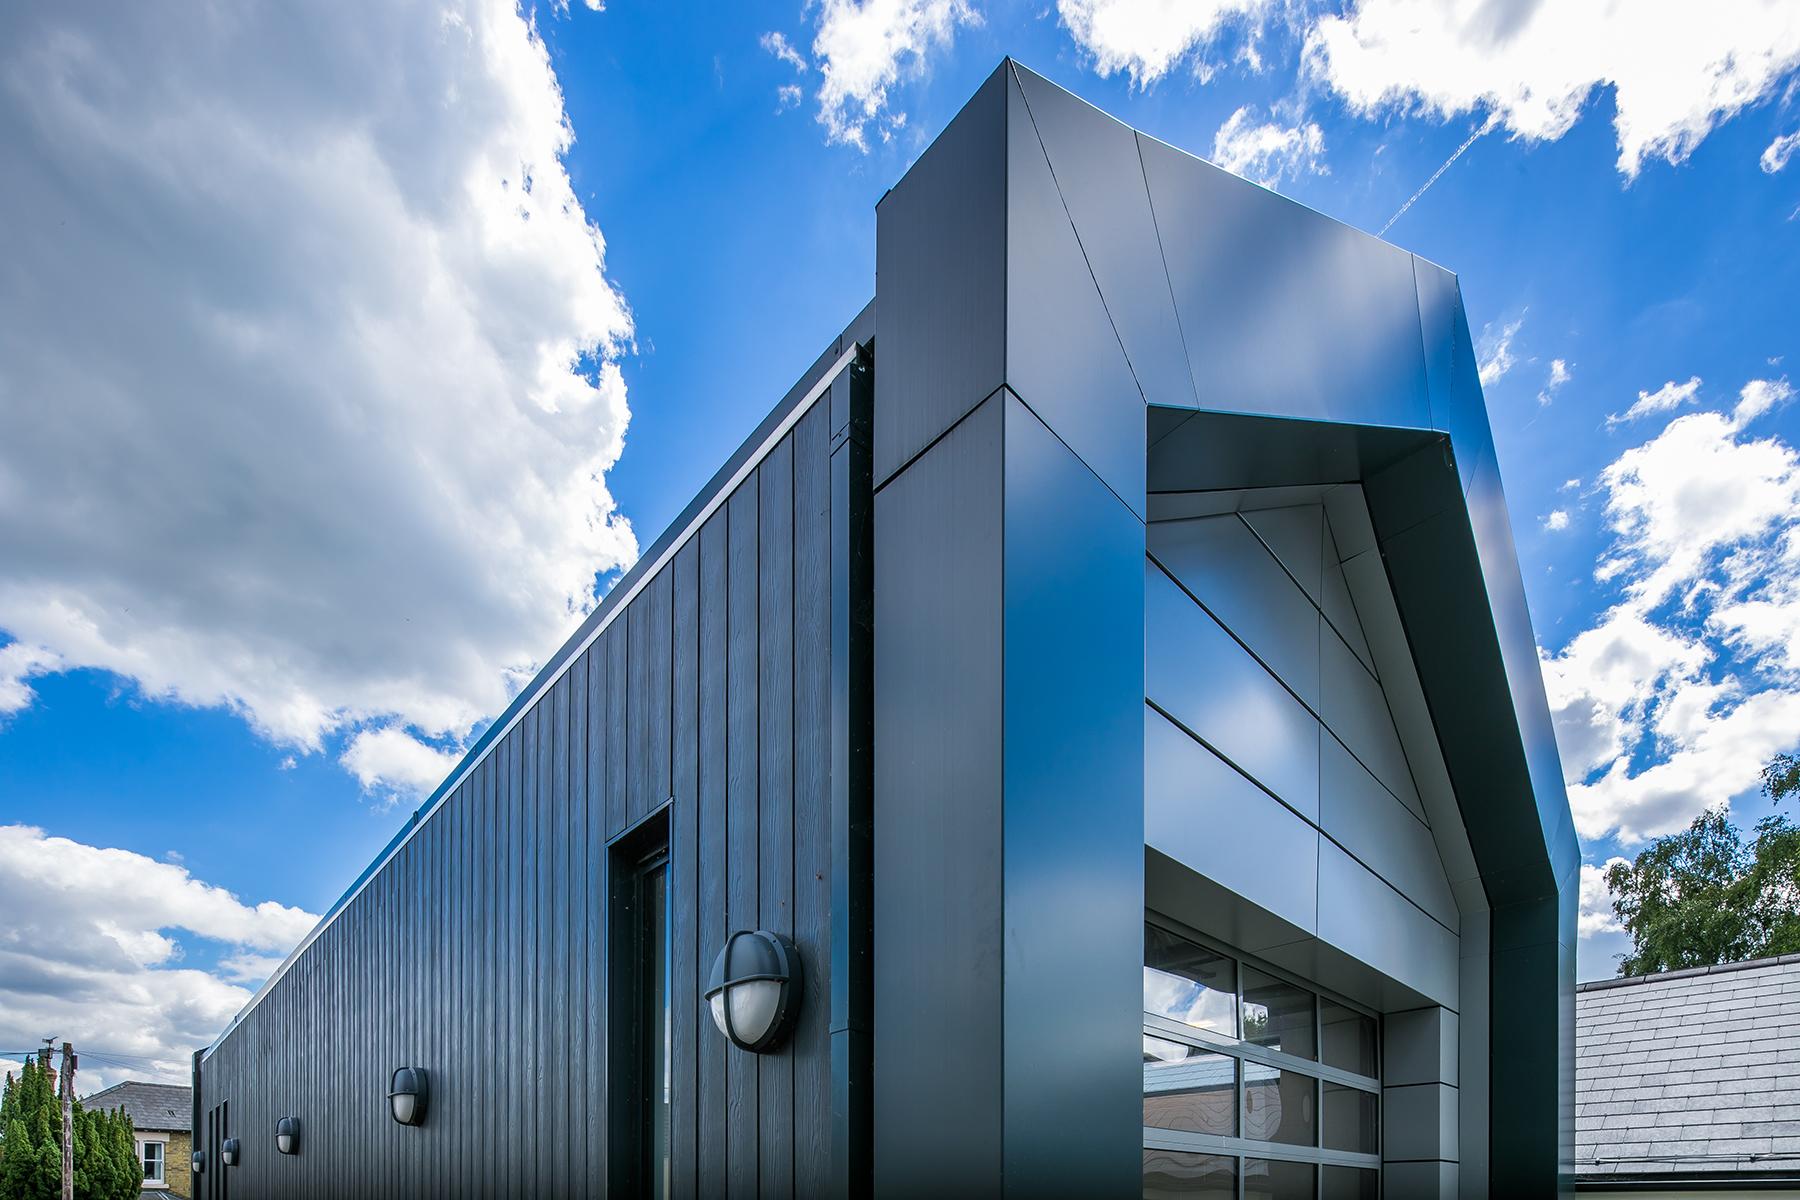 school photography, fire station, cambridgeshire, peterborough, architecture, modern architecture, design, modern design, contemporary, interior photography